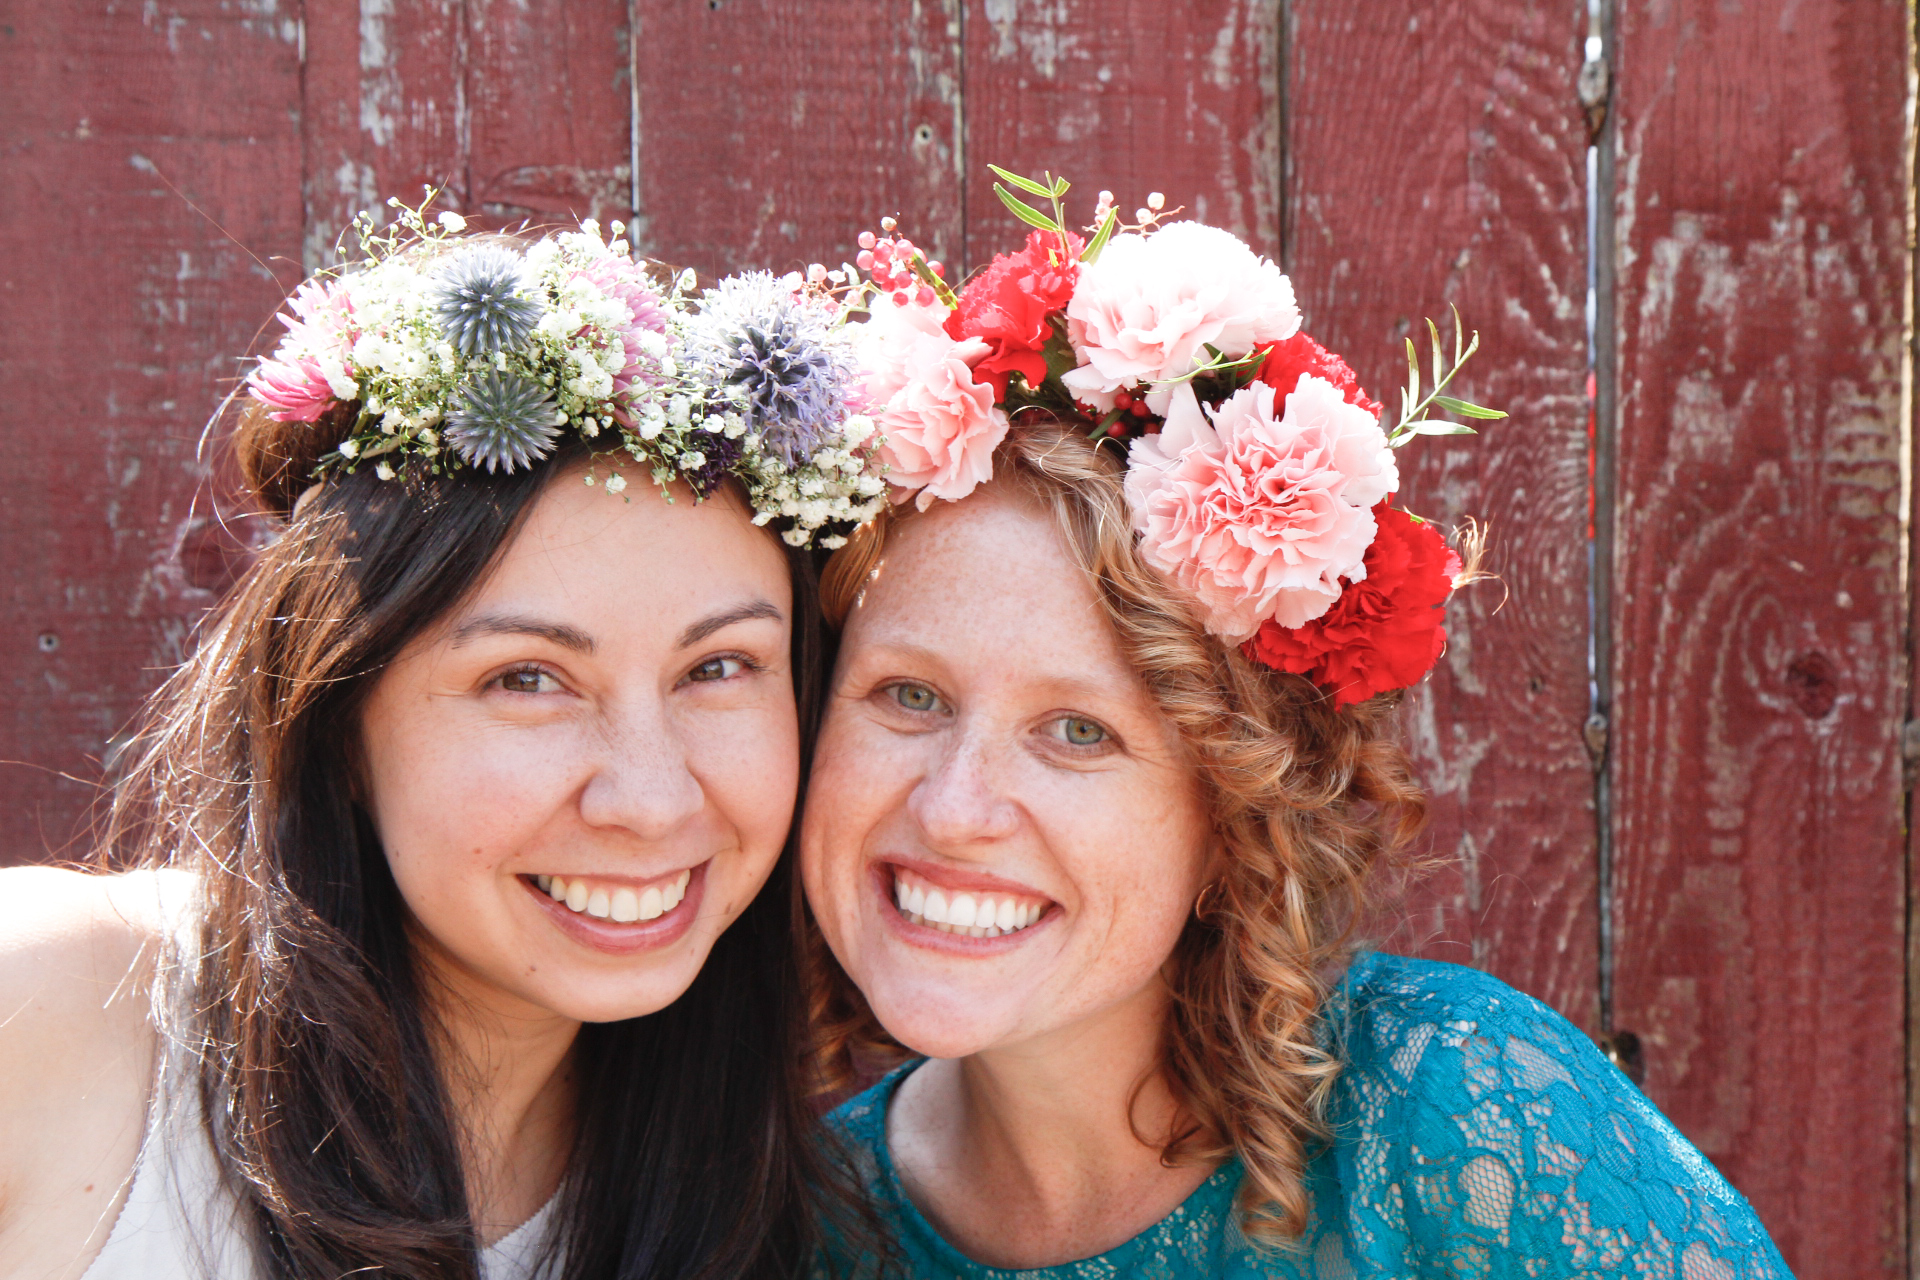 flower crown making bachelorette activity